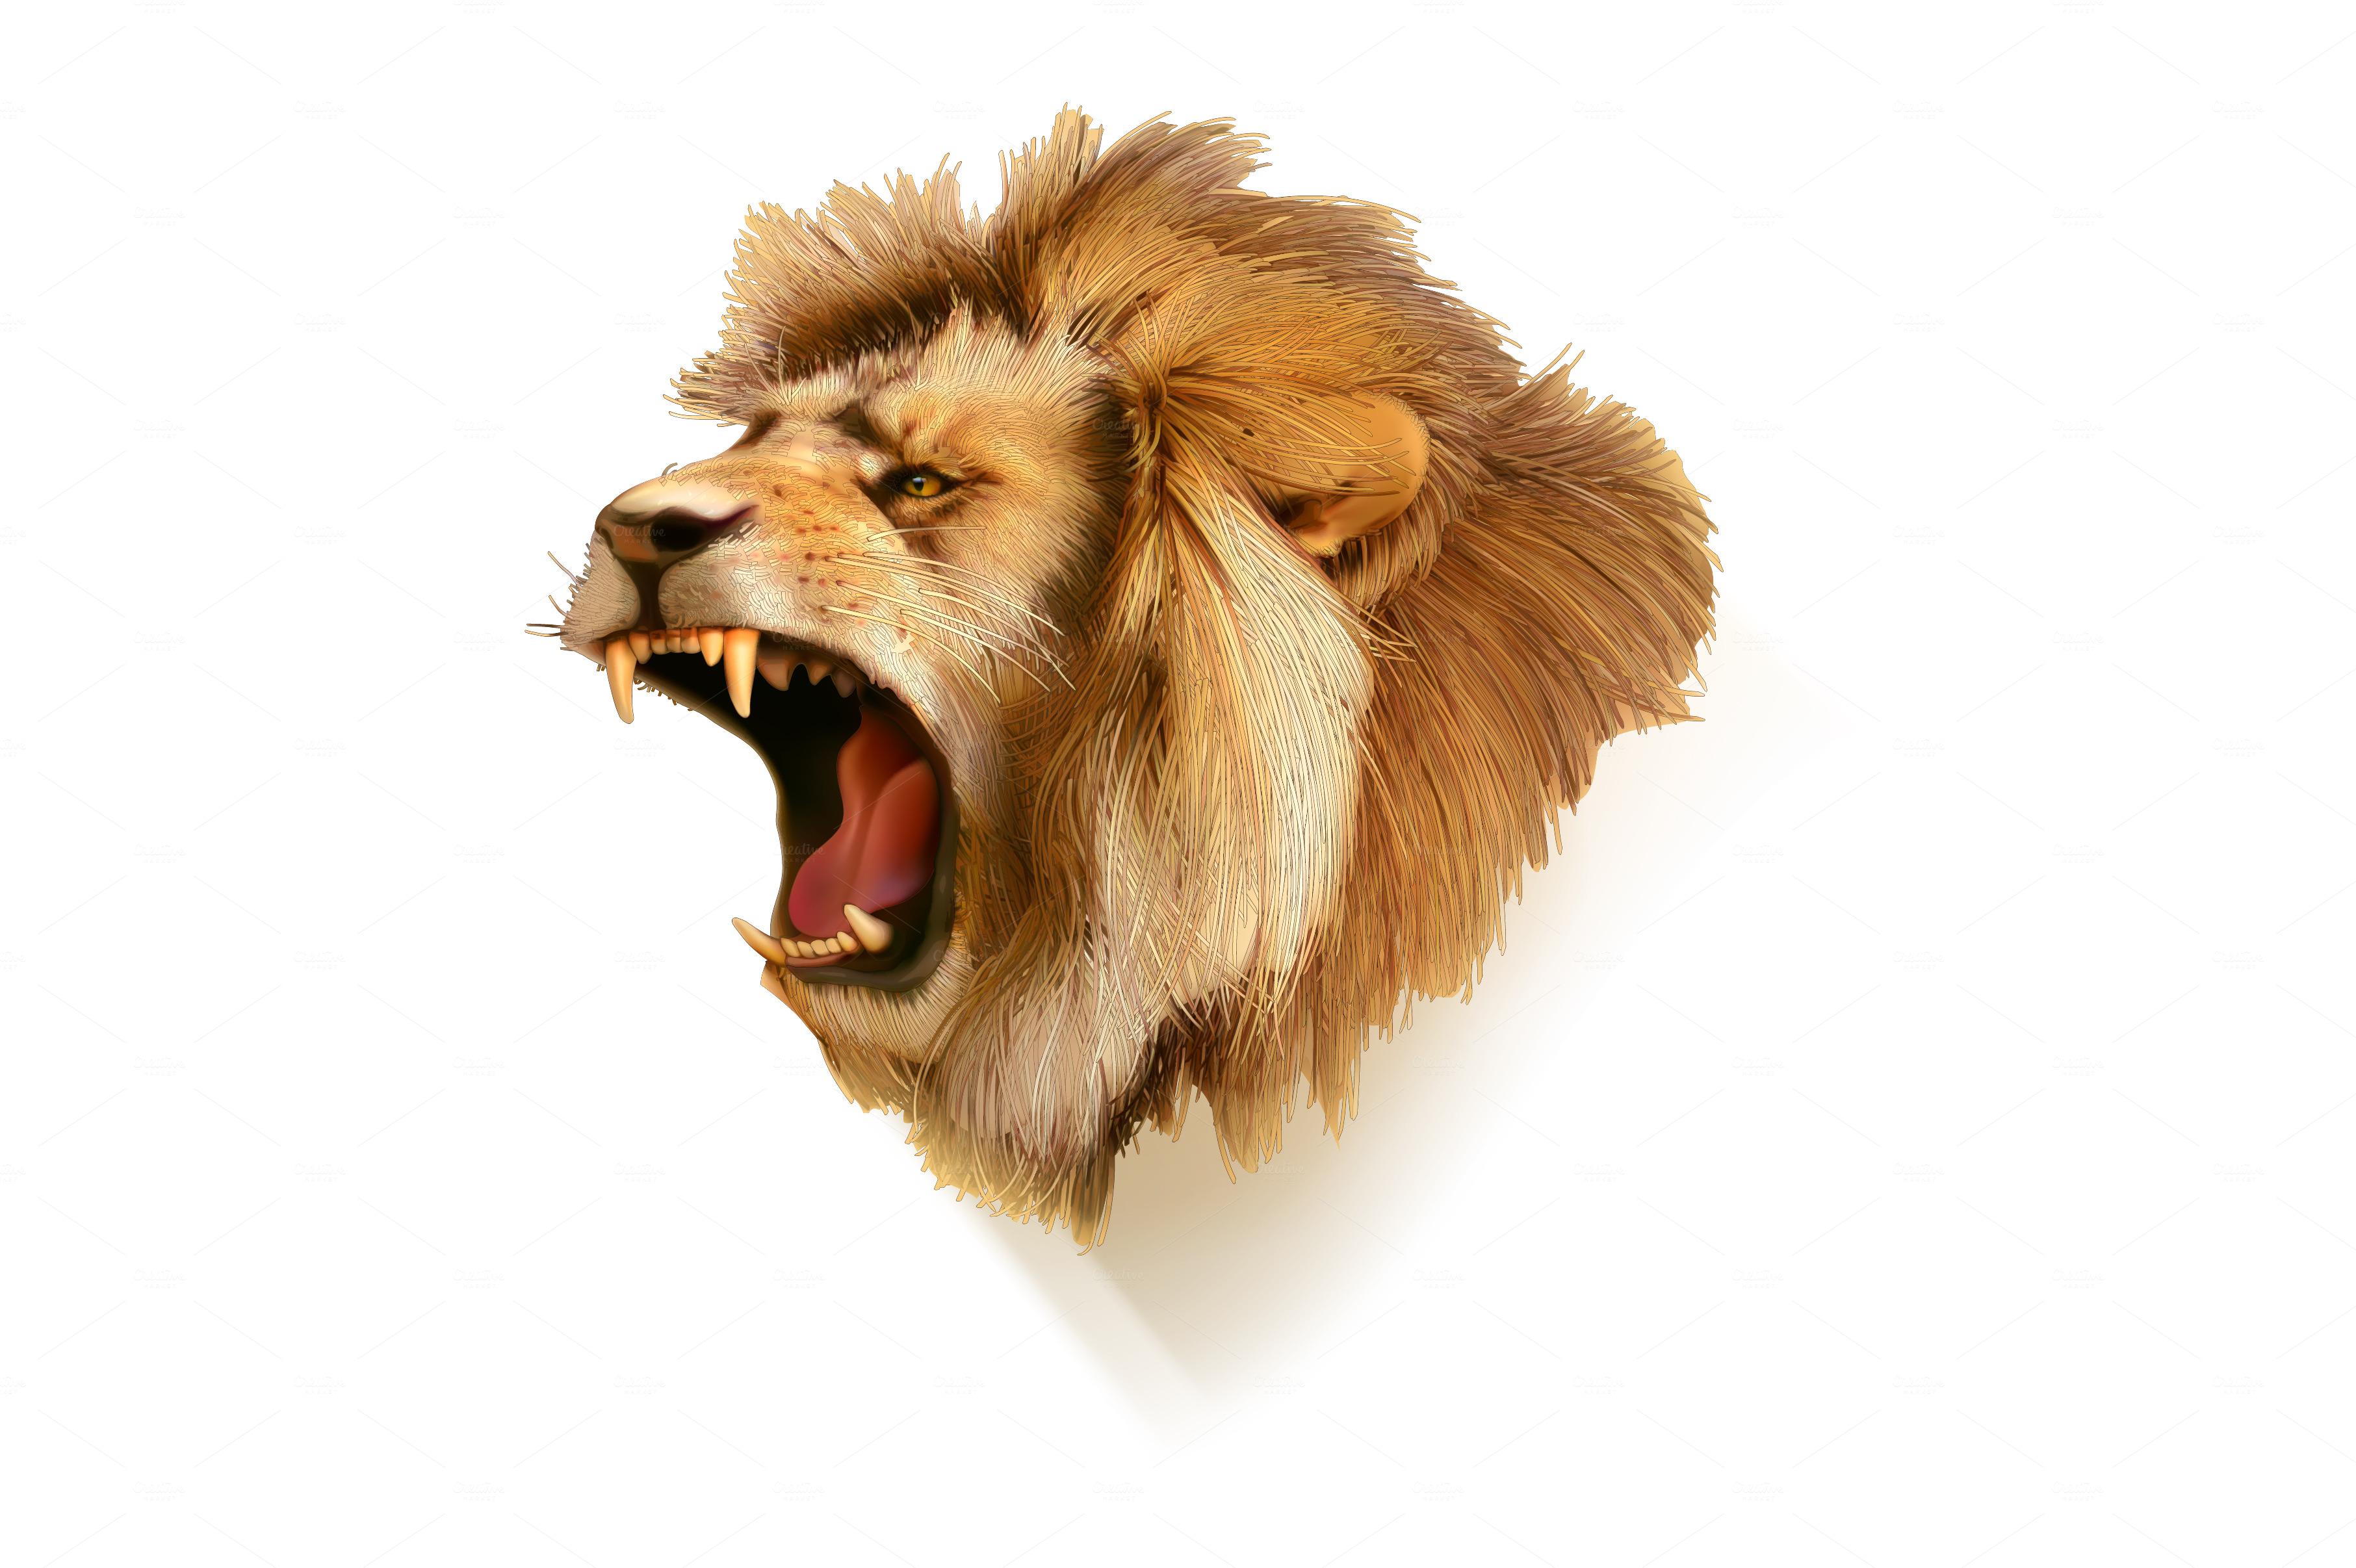 Roaring lion icon ~ Icons on Creative Market: https://creativemarket.com/Natis/372718-Roaring-lion-icon